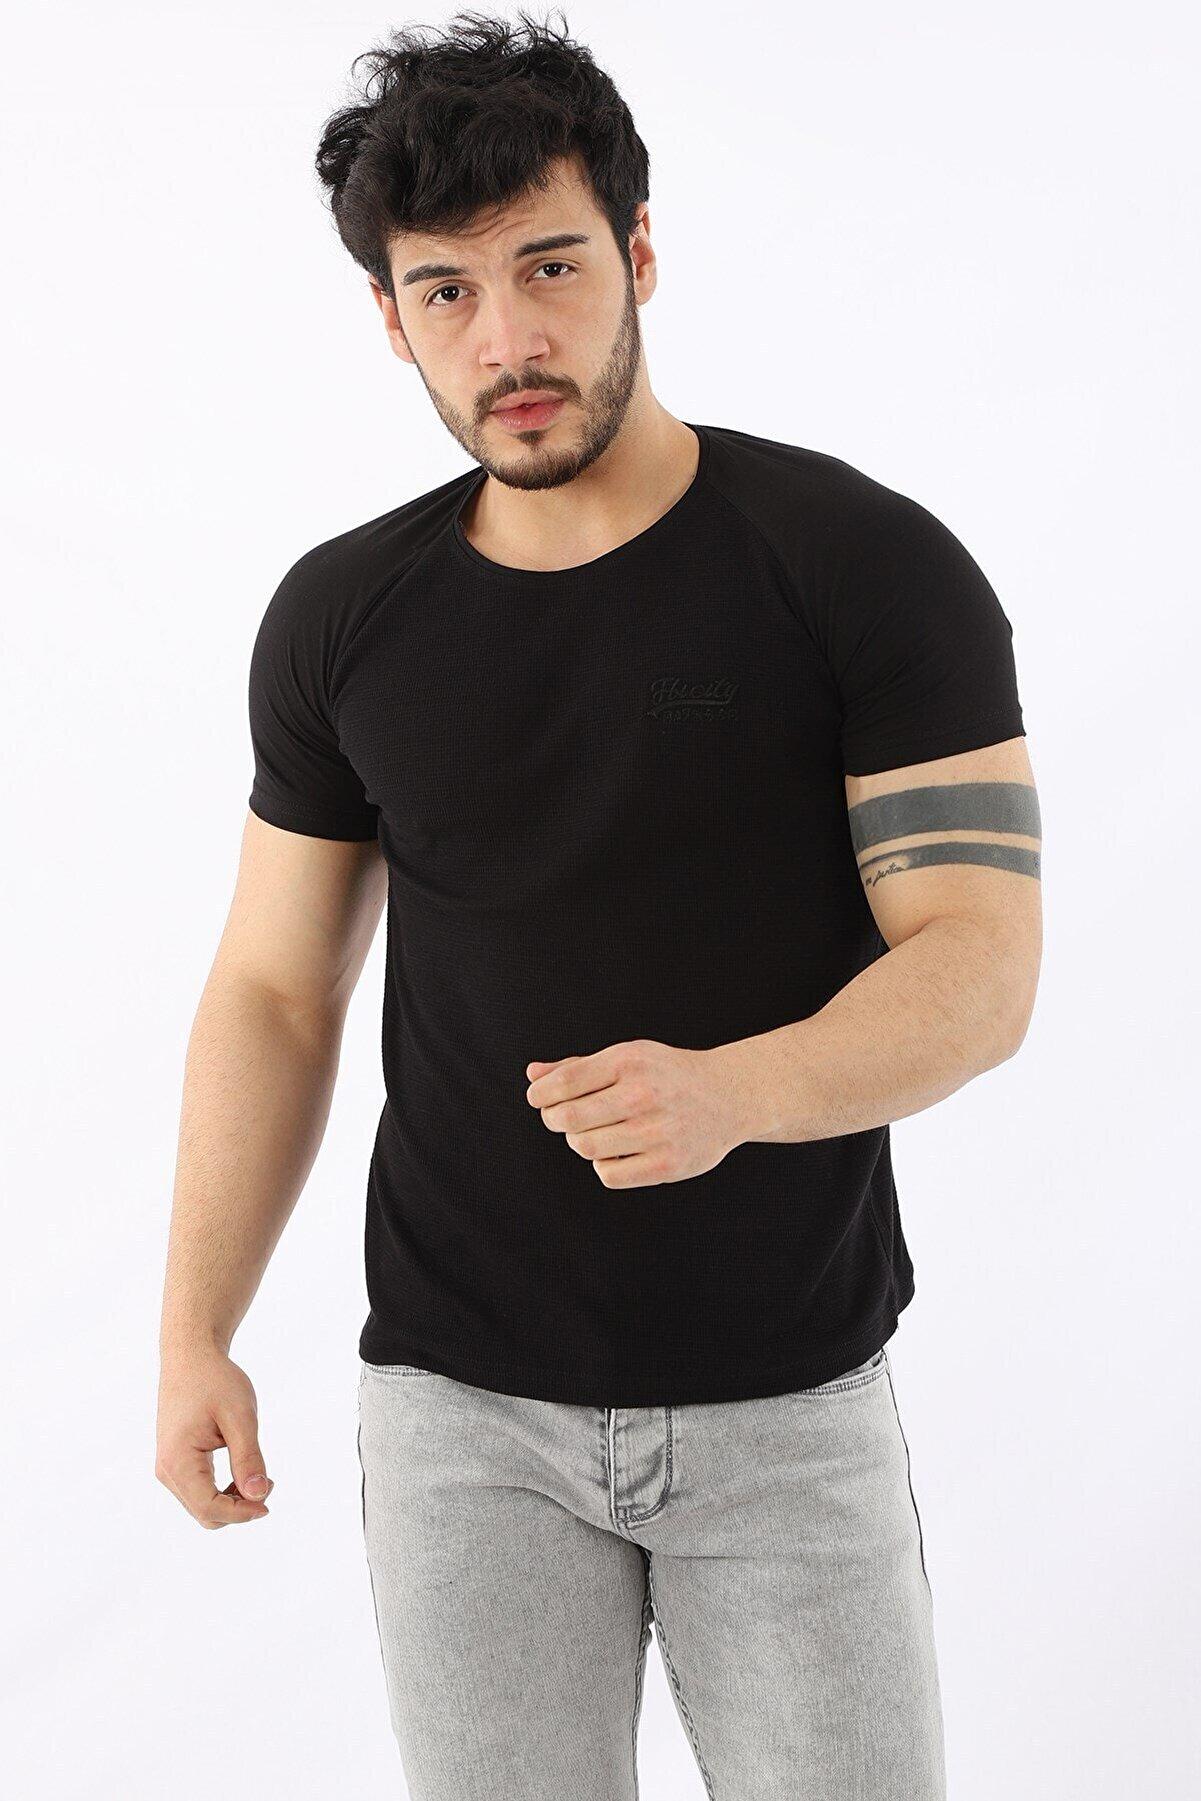 Arlin Erkek Bisiklet Yaka Düz Kısa Kollu Slim Fit Siyah T-shirt